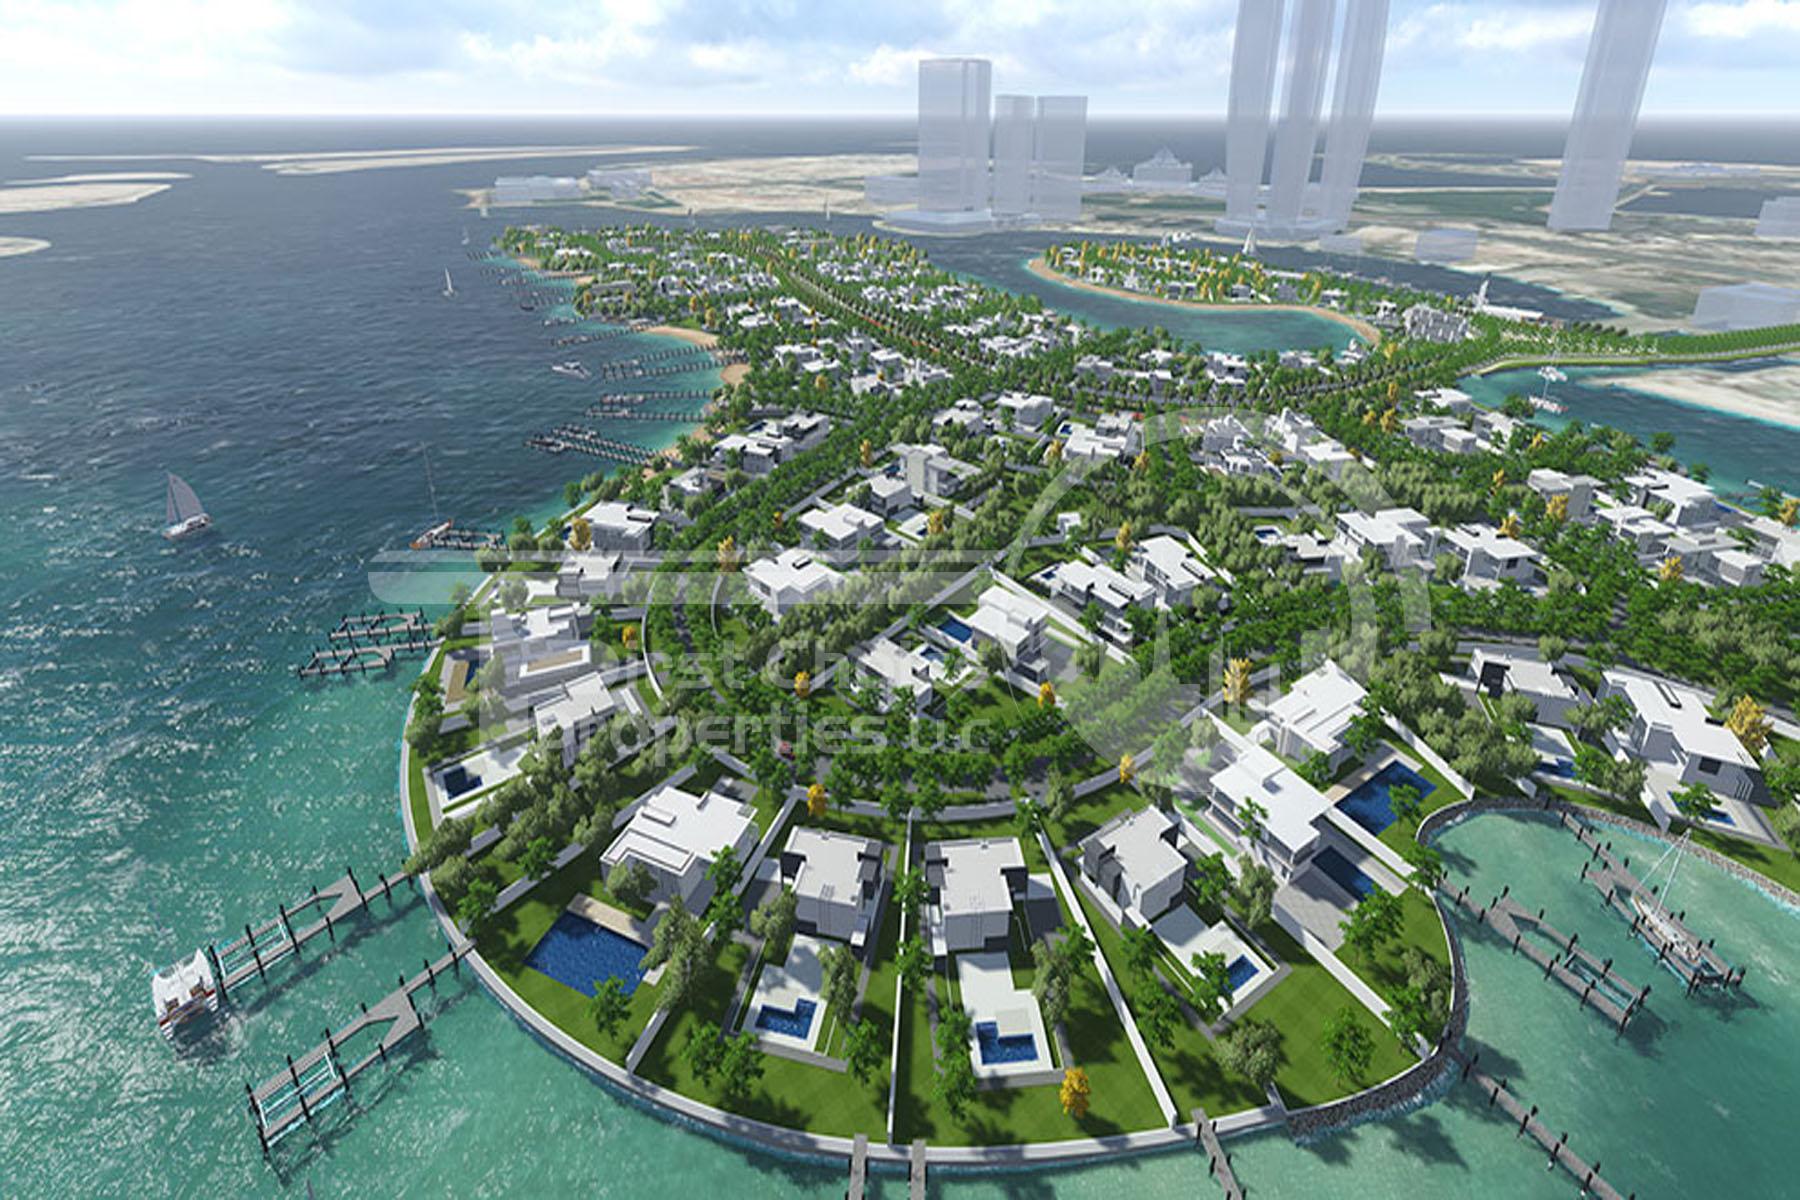 Residential Island - Nareel Island - Al Bateen - Abu Dhabi - UAE (15).jpg